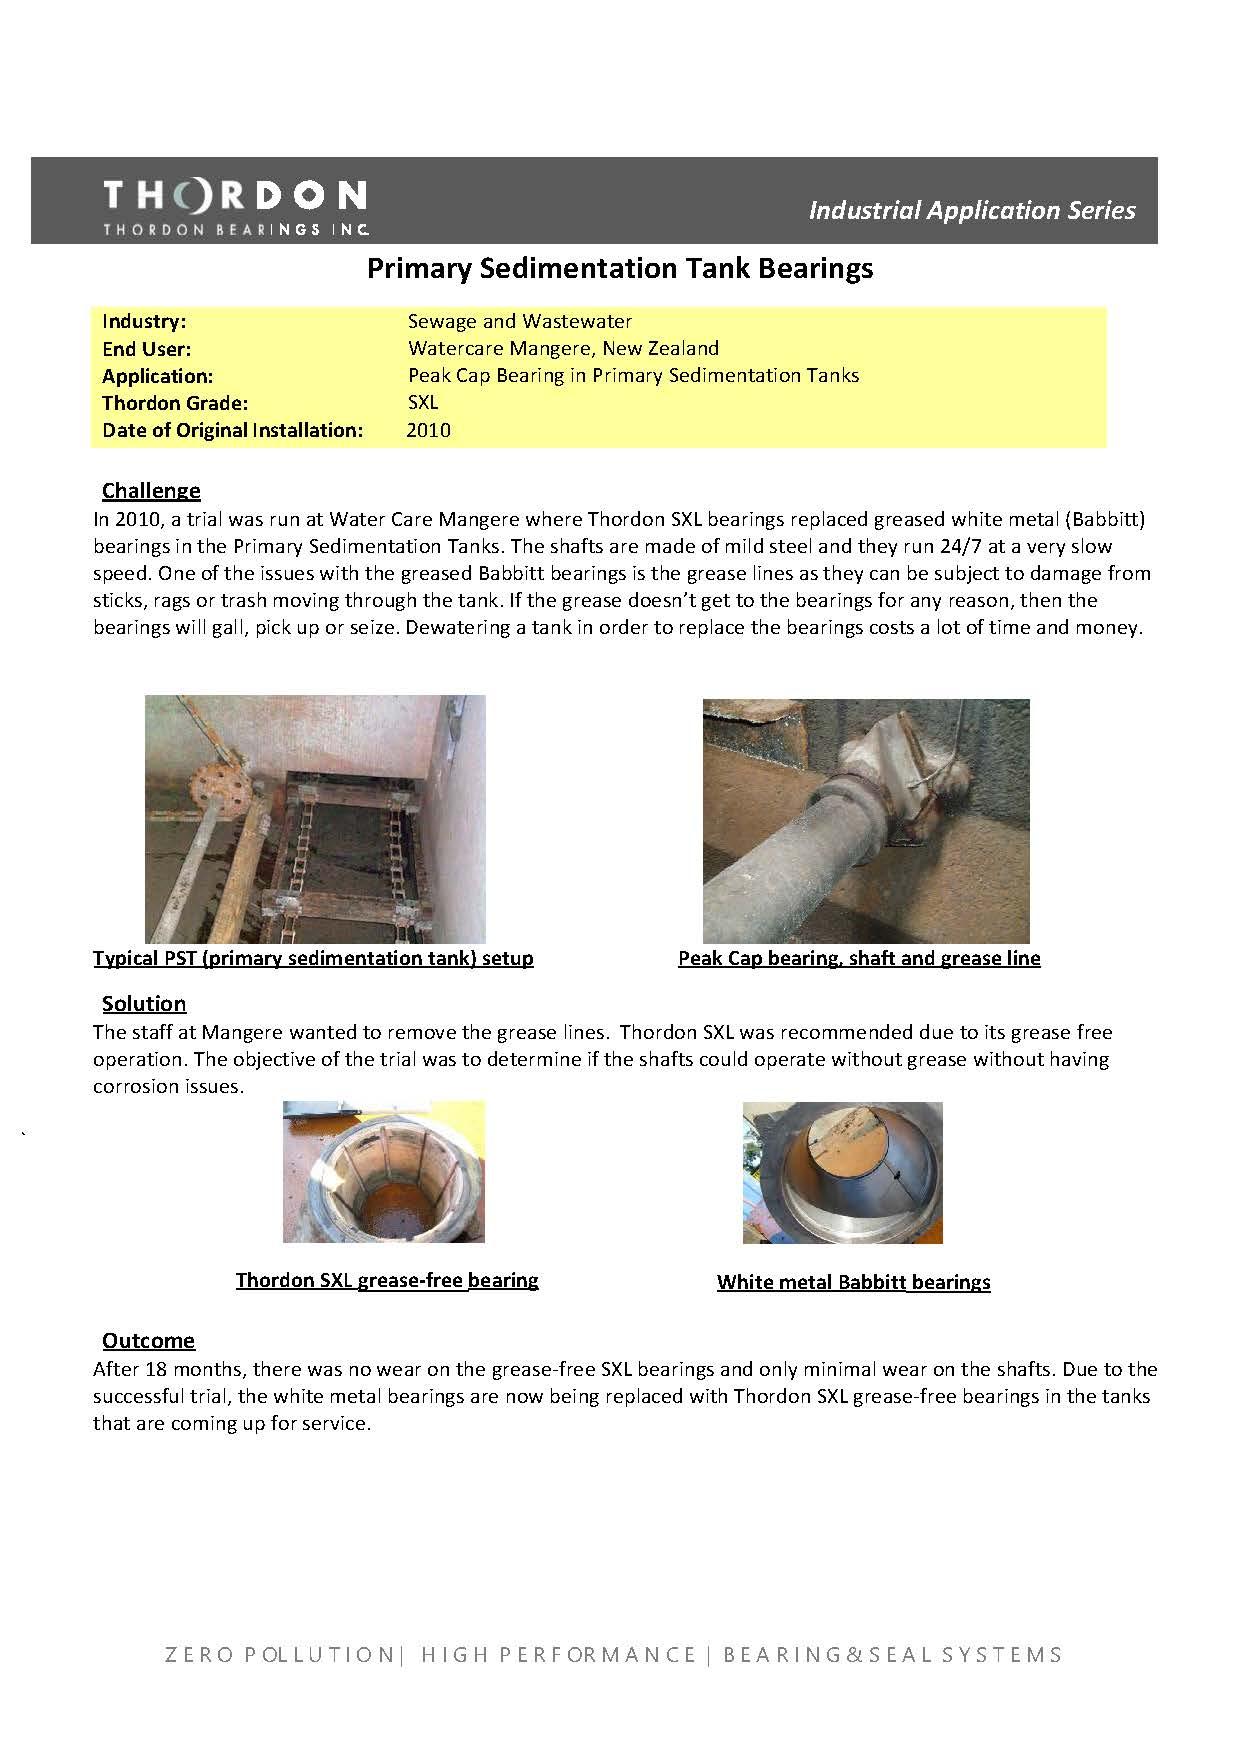 15006- Thordon Primary Sedimentation Bearings